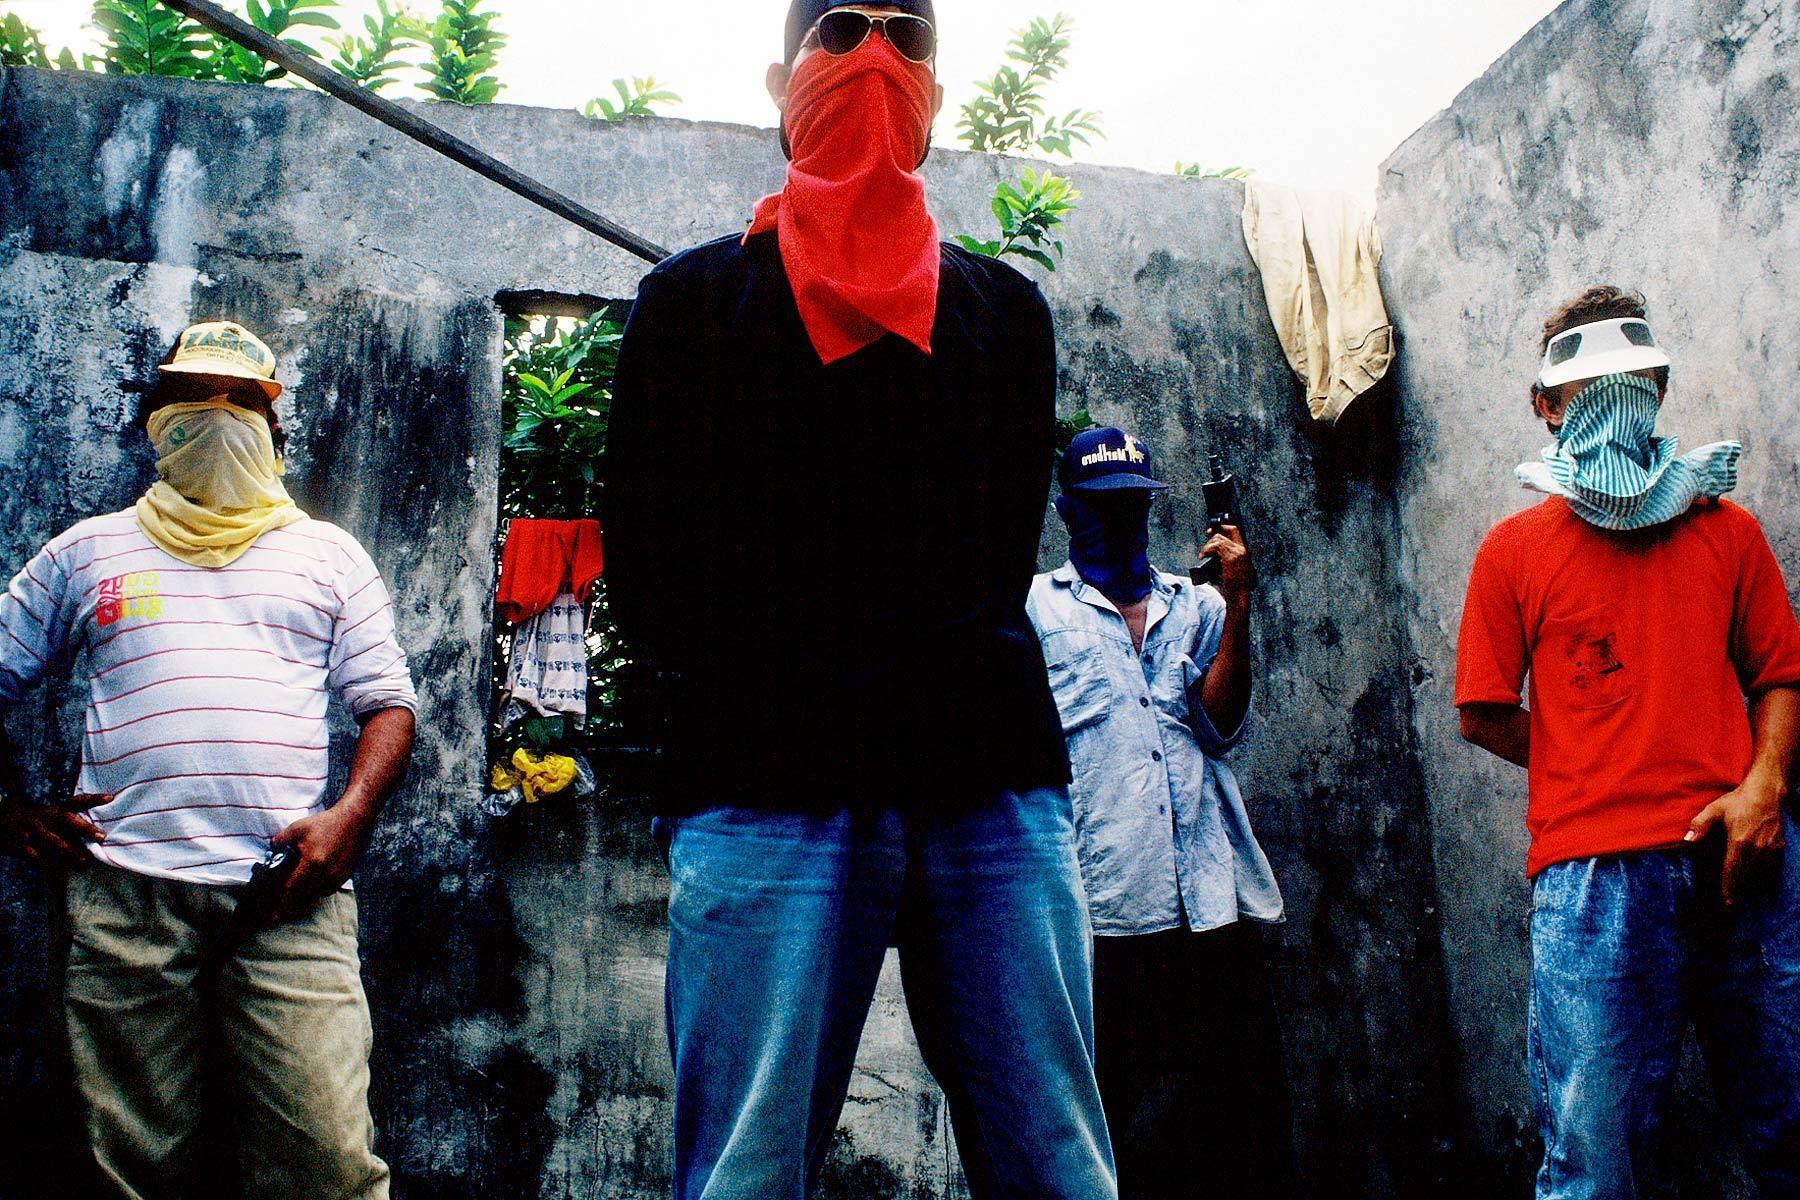 ELN members, Marxist-Leninist/Liberation Theology movement.